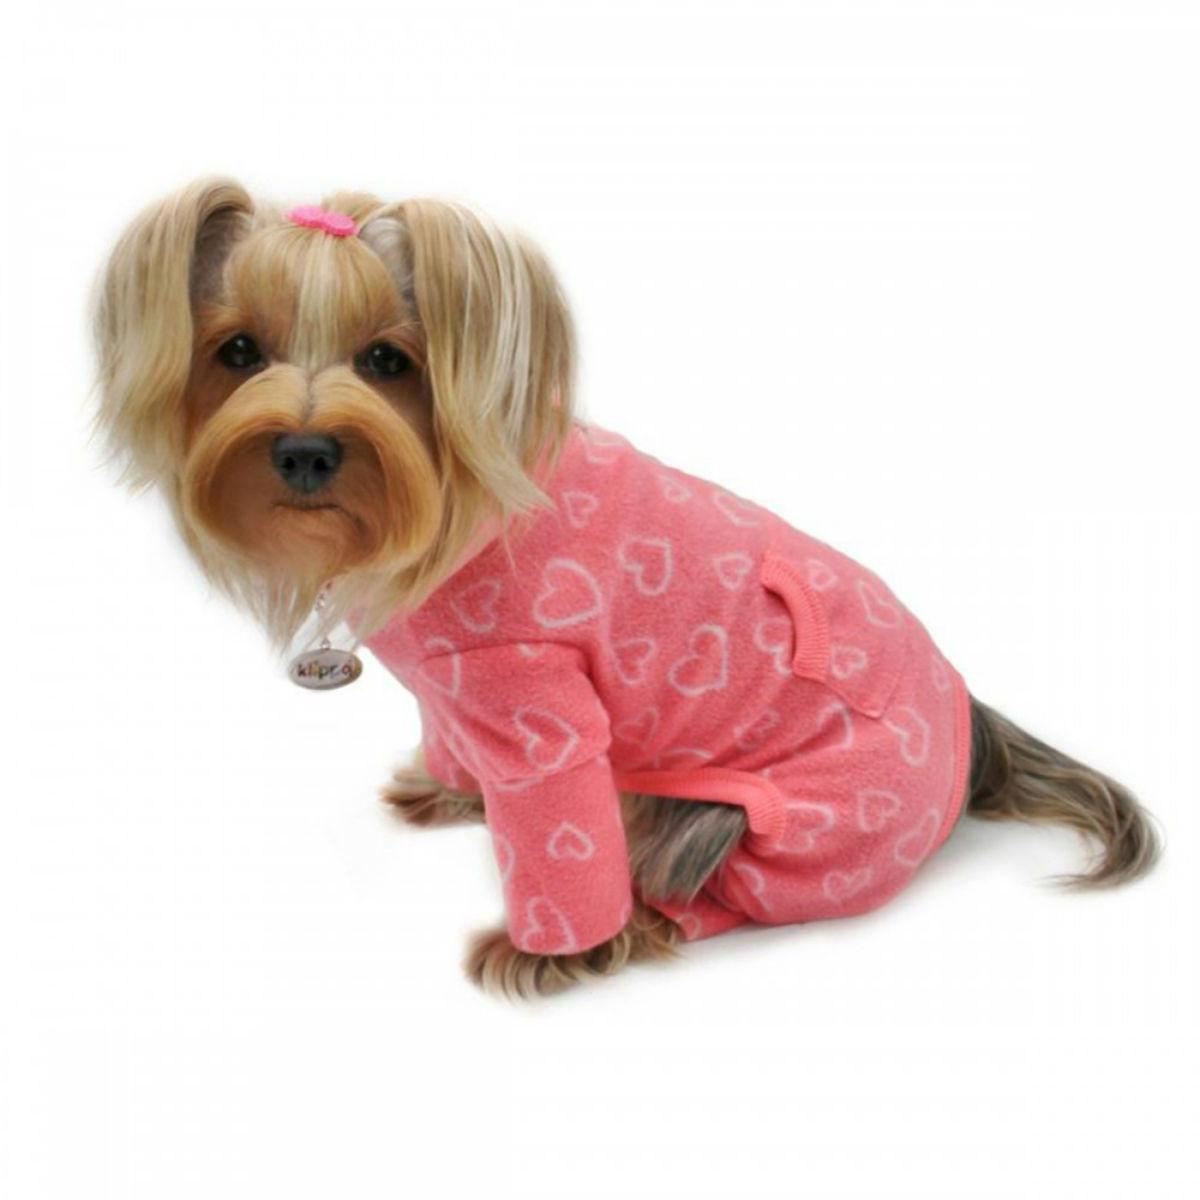 Blush of Love Turtleneck Fleece Dog Pajamas by Klippo